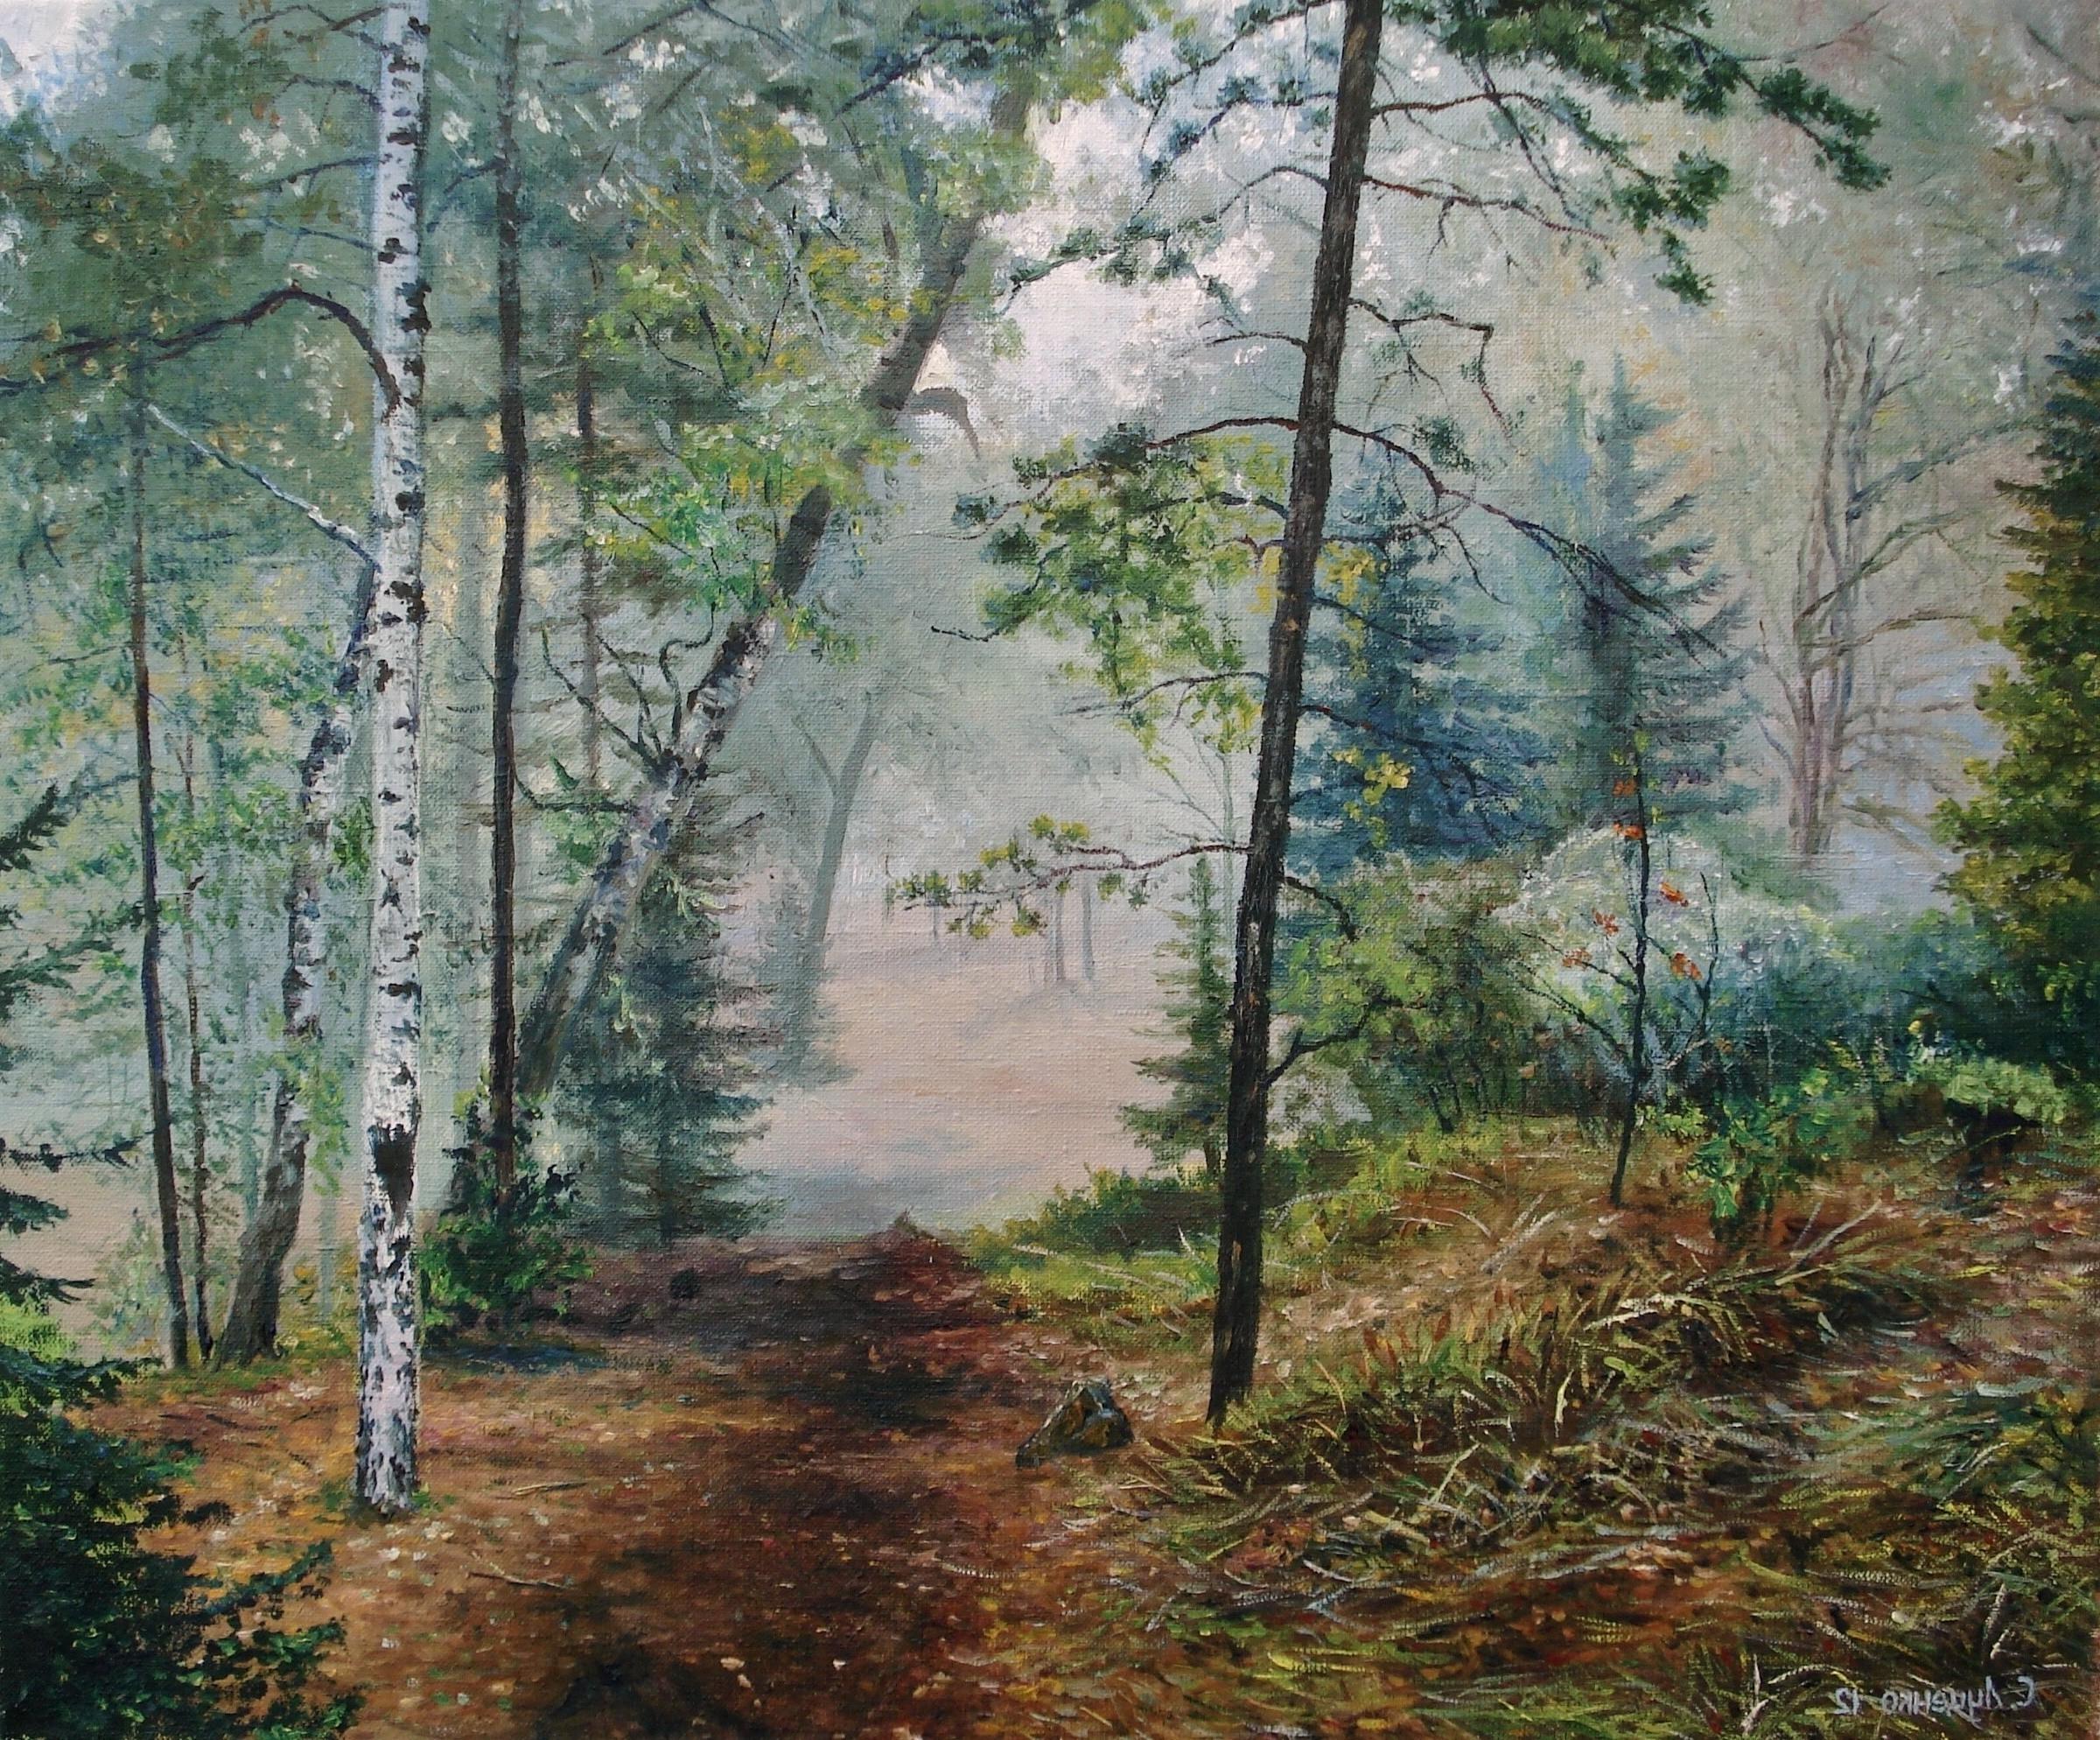 наличии лес живопись картинки одинокая